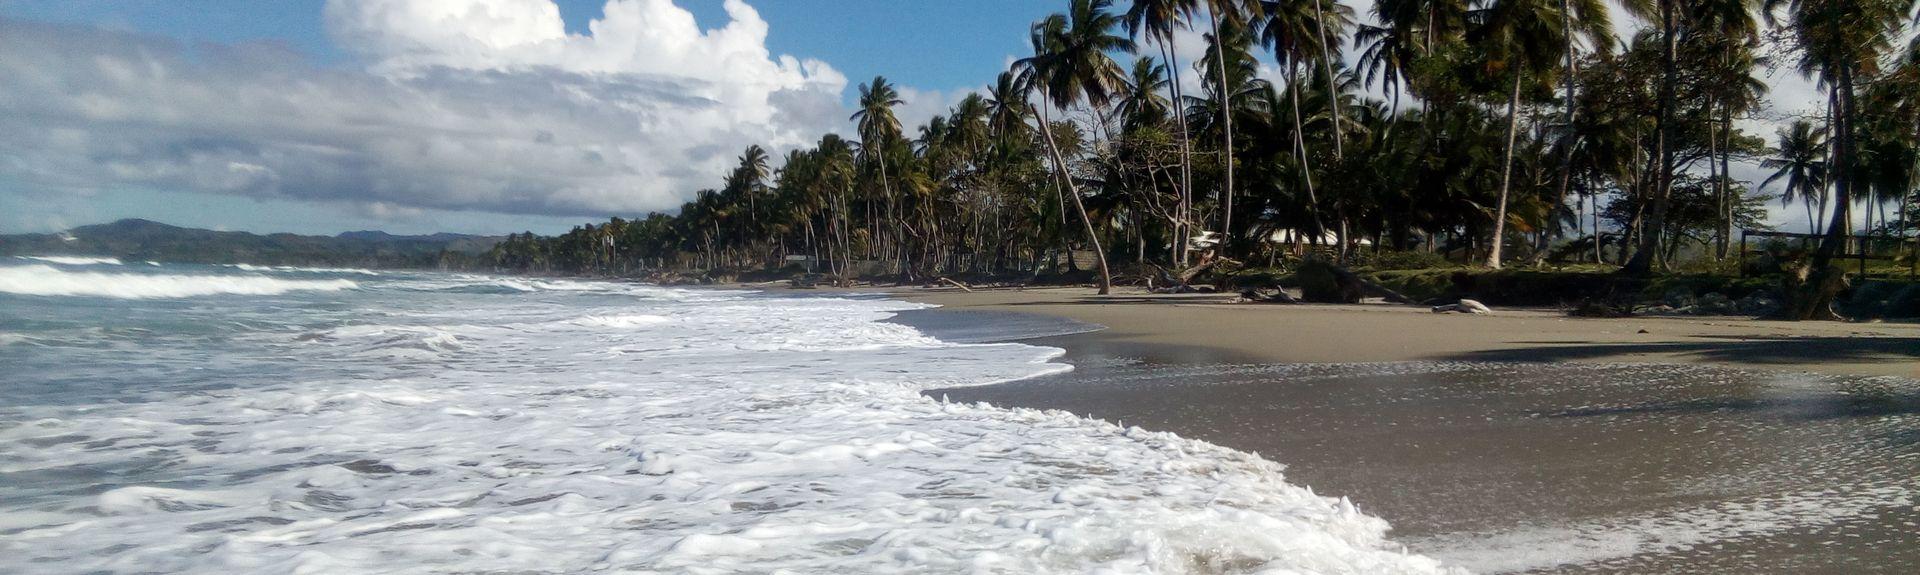 San Francisco de Macorís, Duarte, Dominikanische Republik